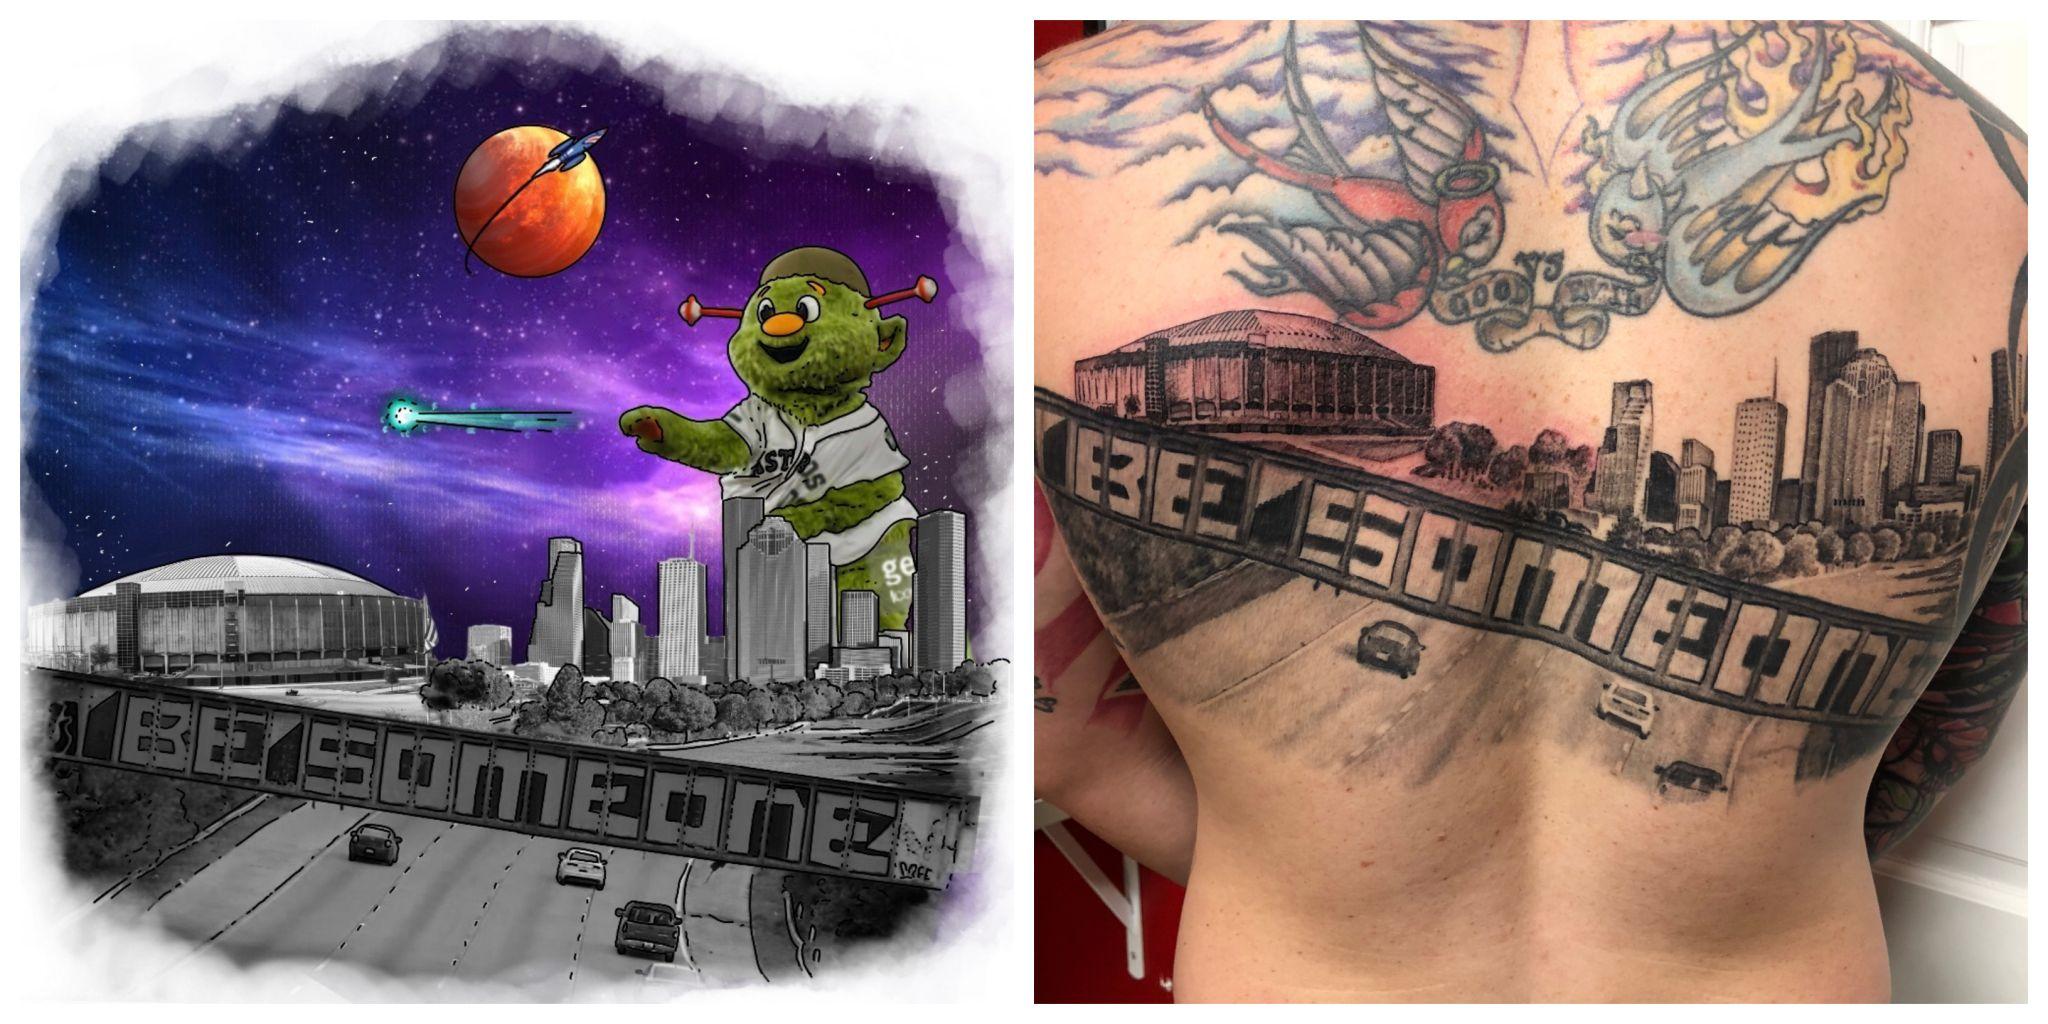 Texas man gets the most Houston tattoo ever - San Antonio Express-News